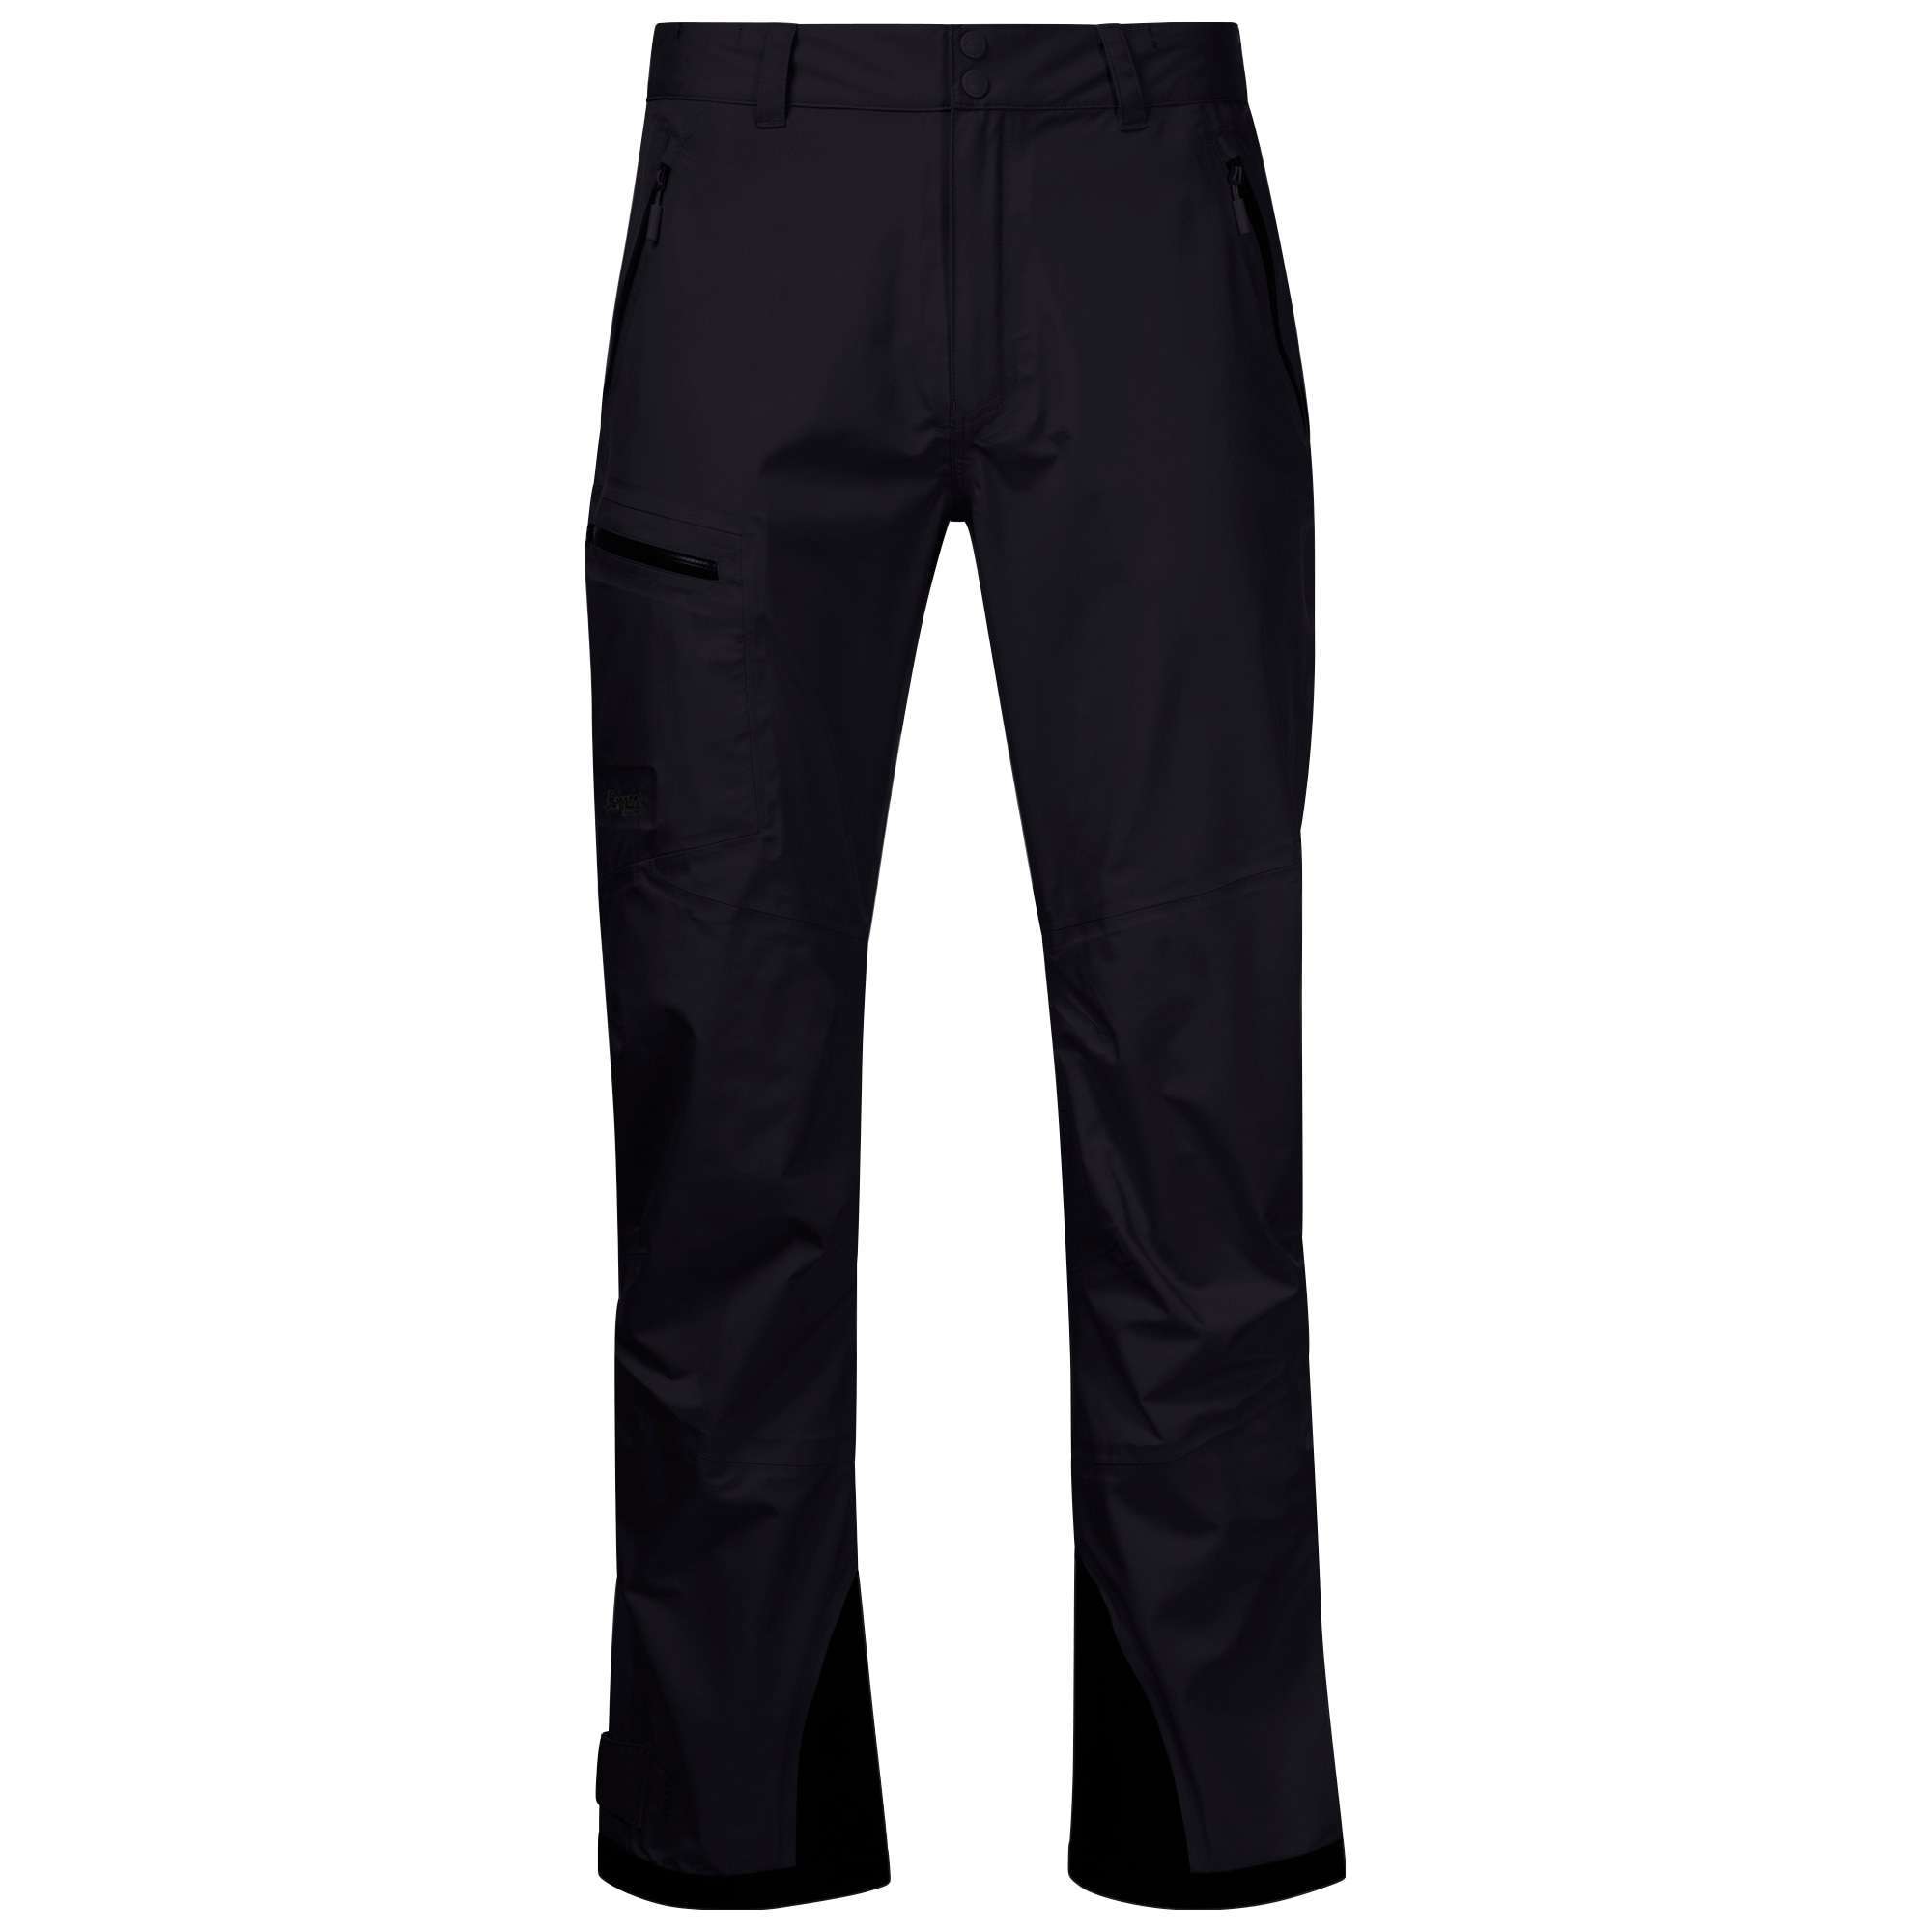 Romsdal 3L LongZip Pants